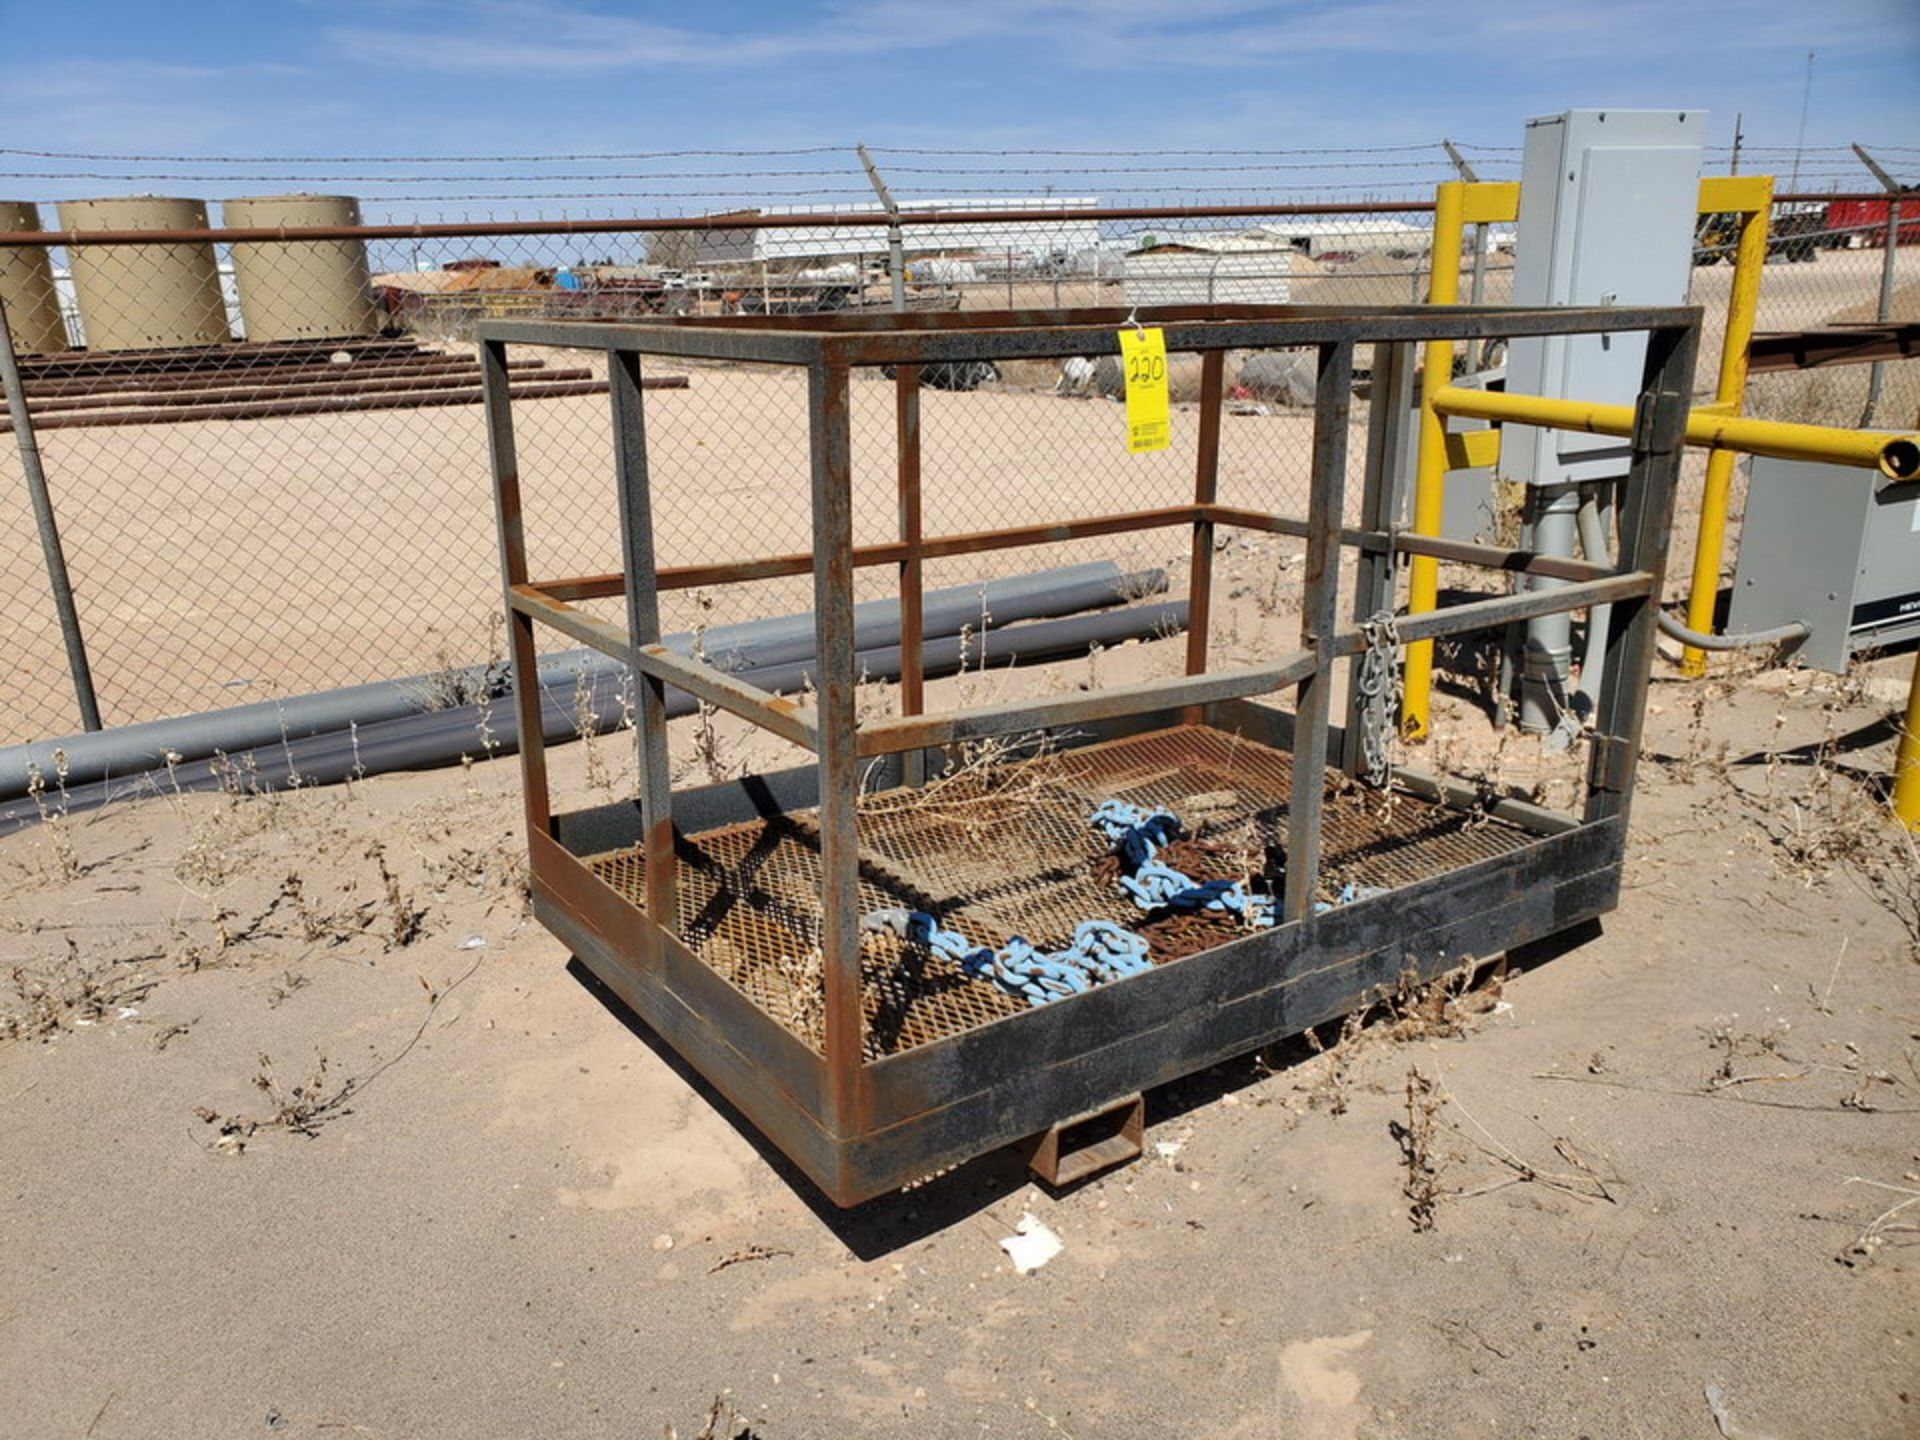 "Forklift Stl Work Basket 72"" x 48"" x 50""H; W/ Lifting Chains"